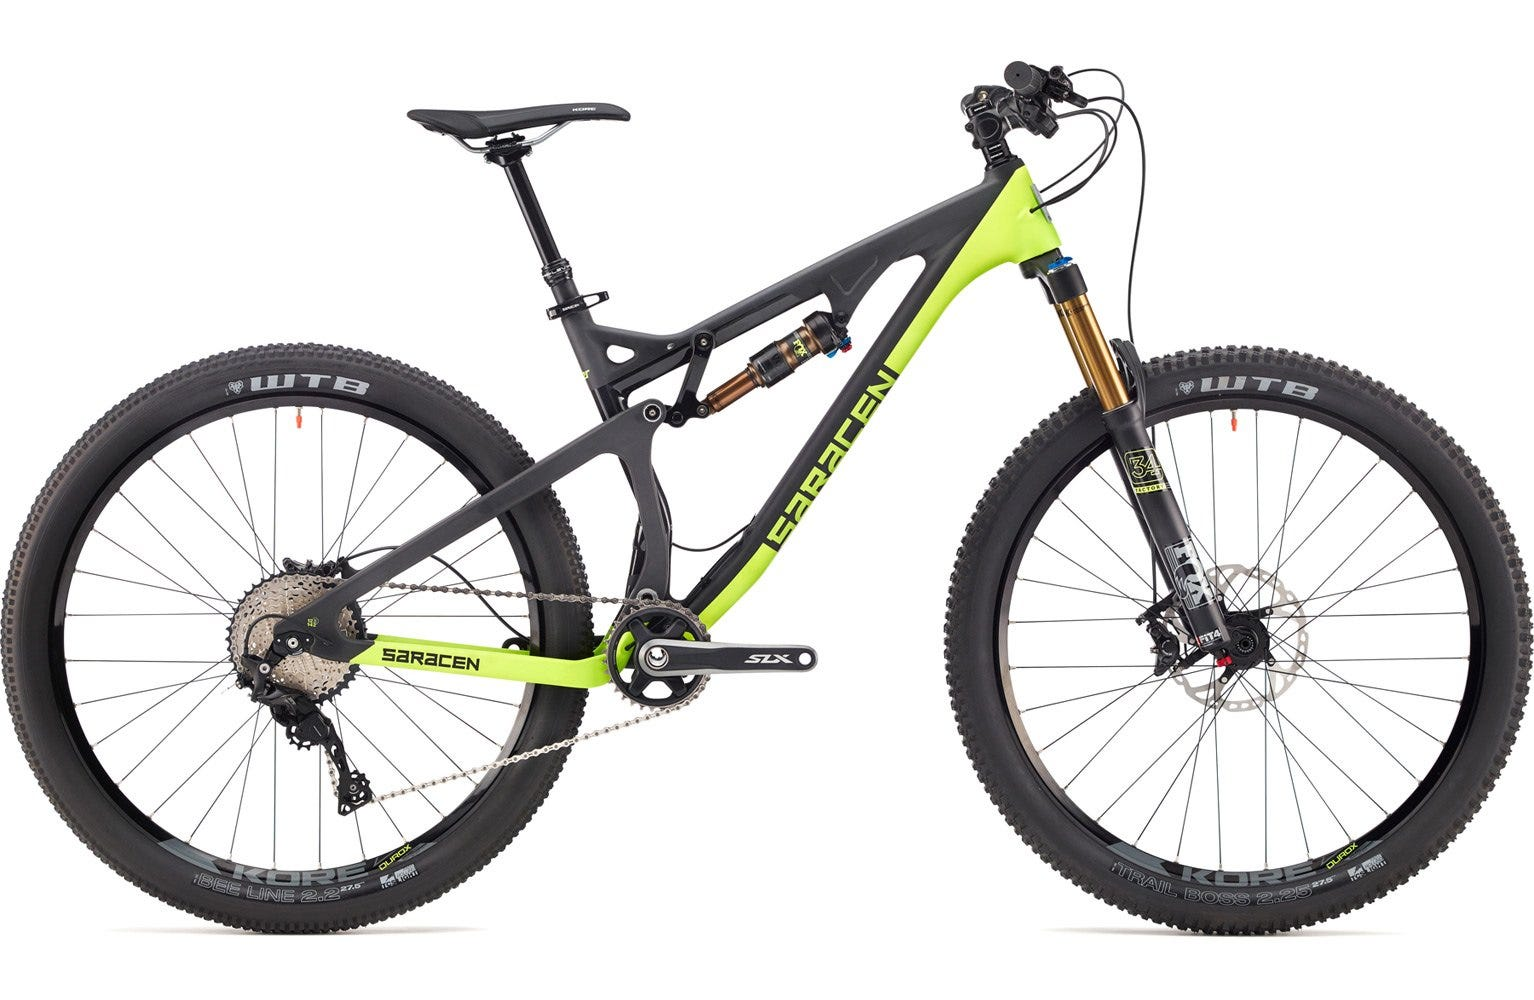 Saracen Kili Flyer Elite 17 inch bike Ex Display